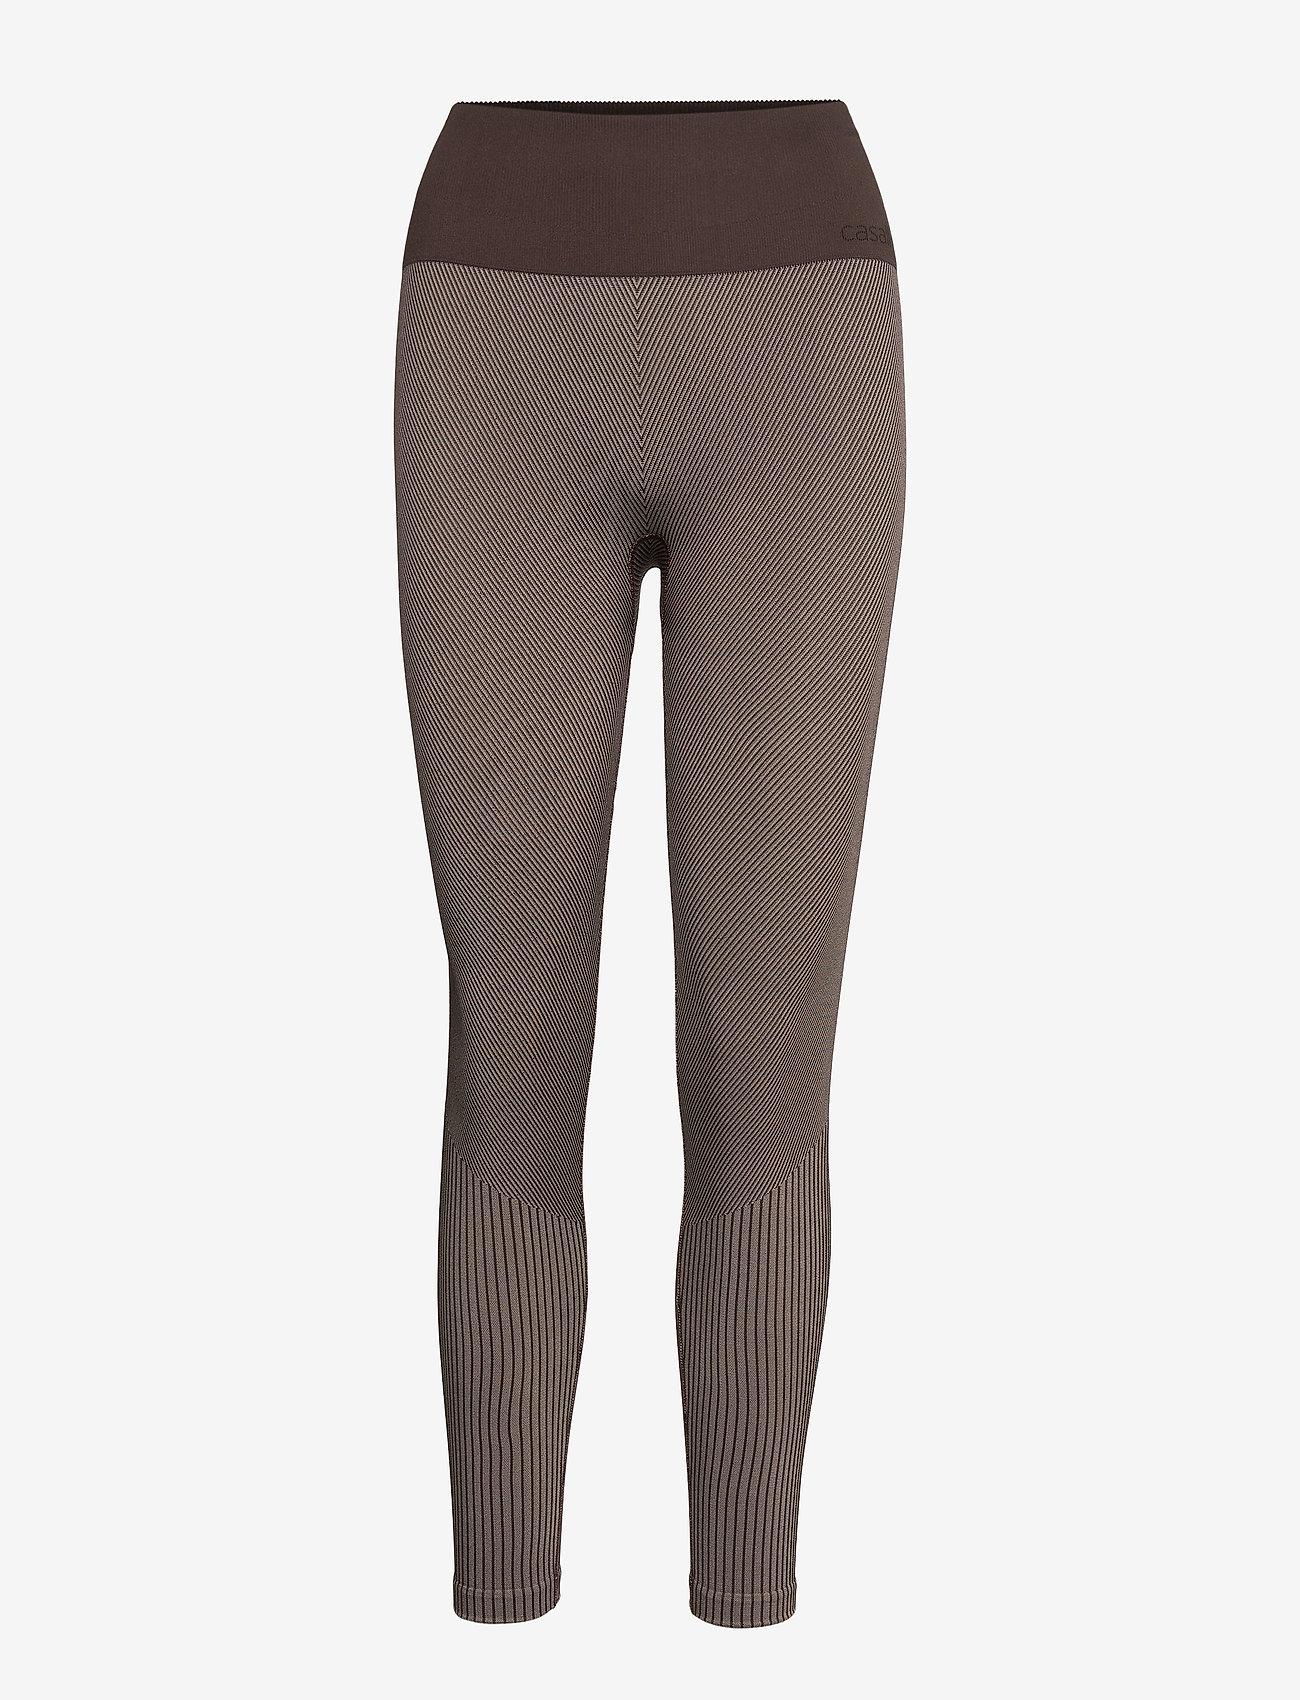 Casall - Seamless tights - running & training tights - berlin brown - 0